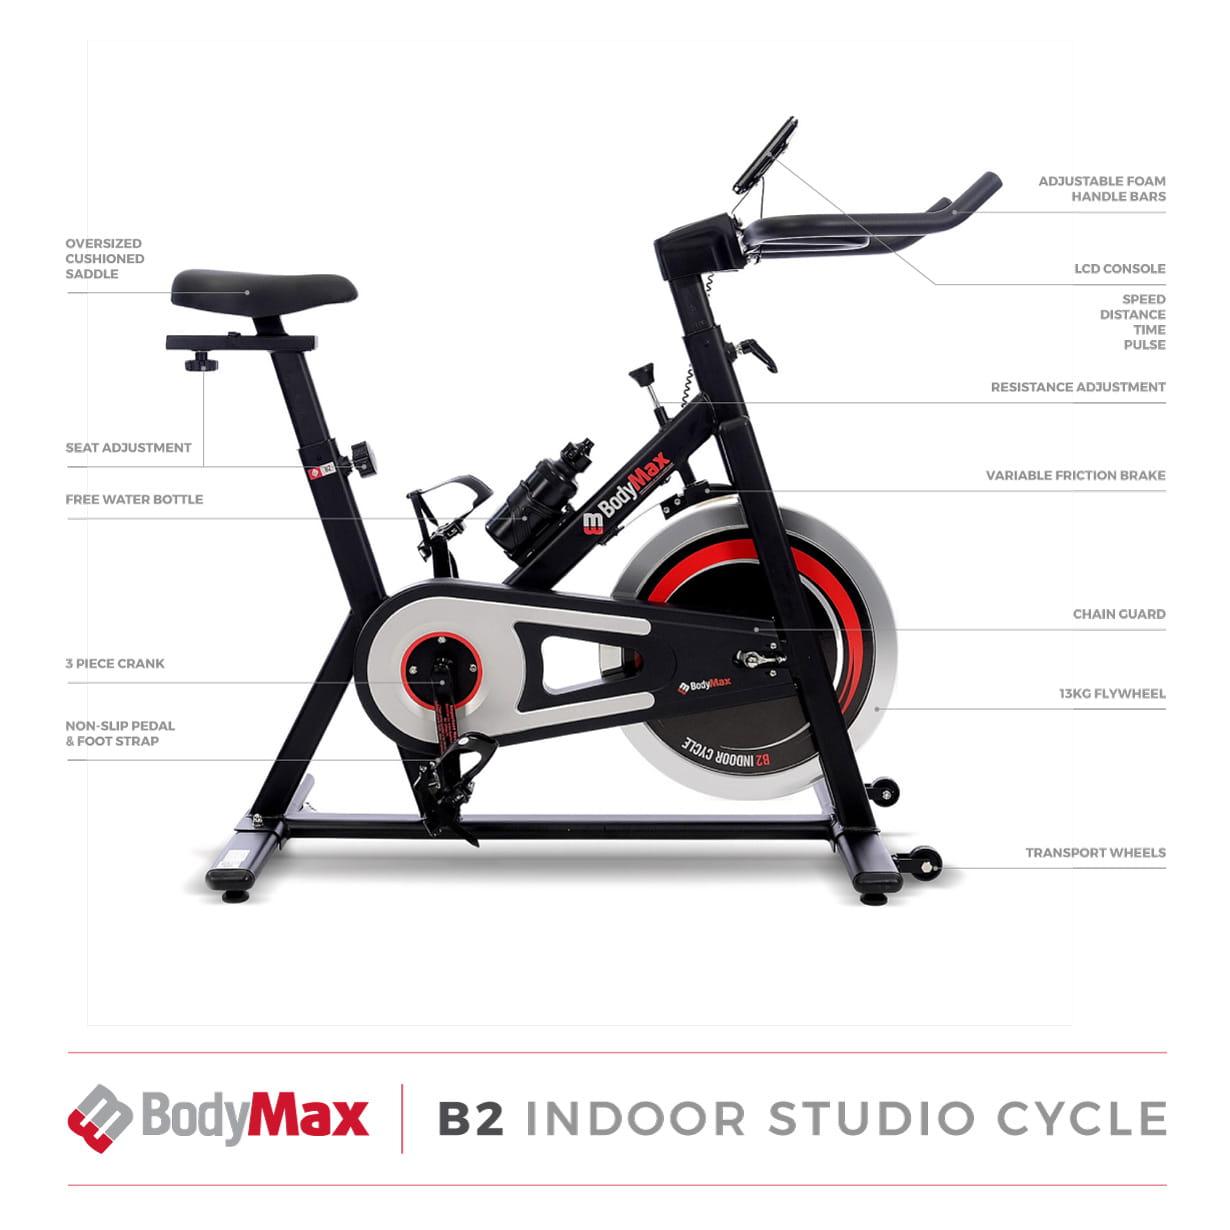 Bodymax B2 Biker